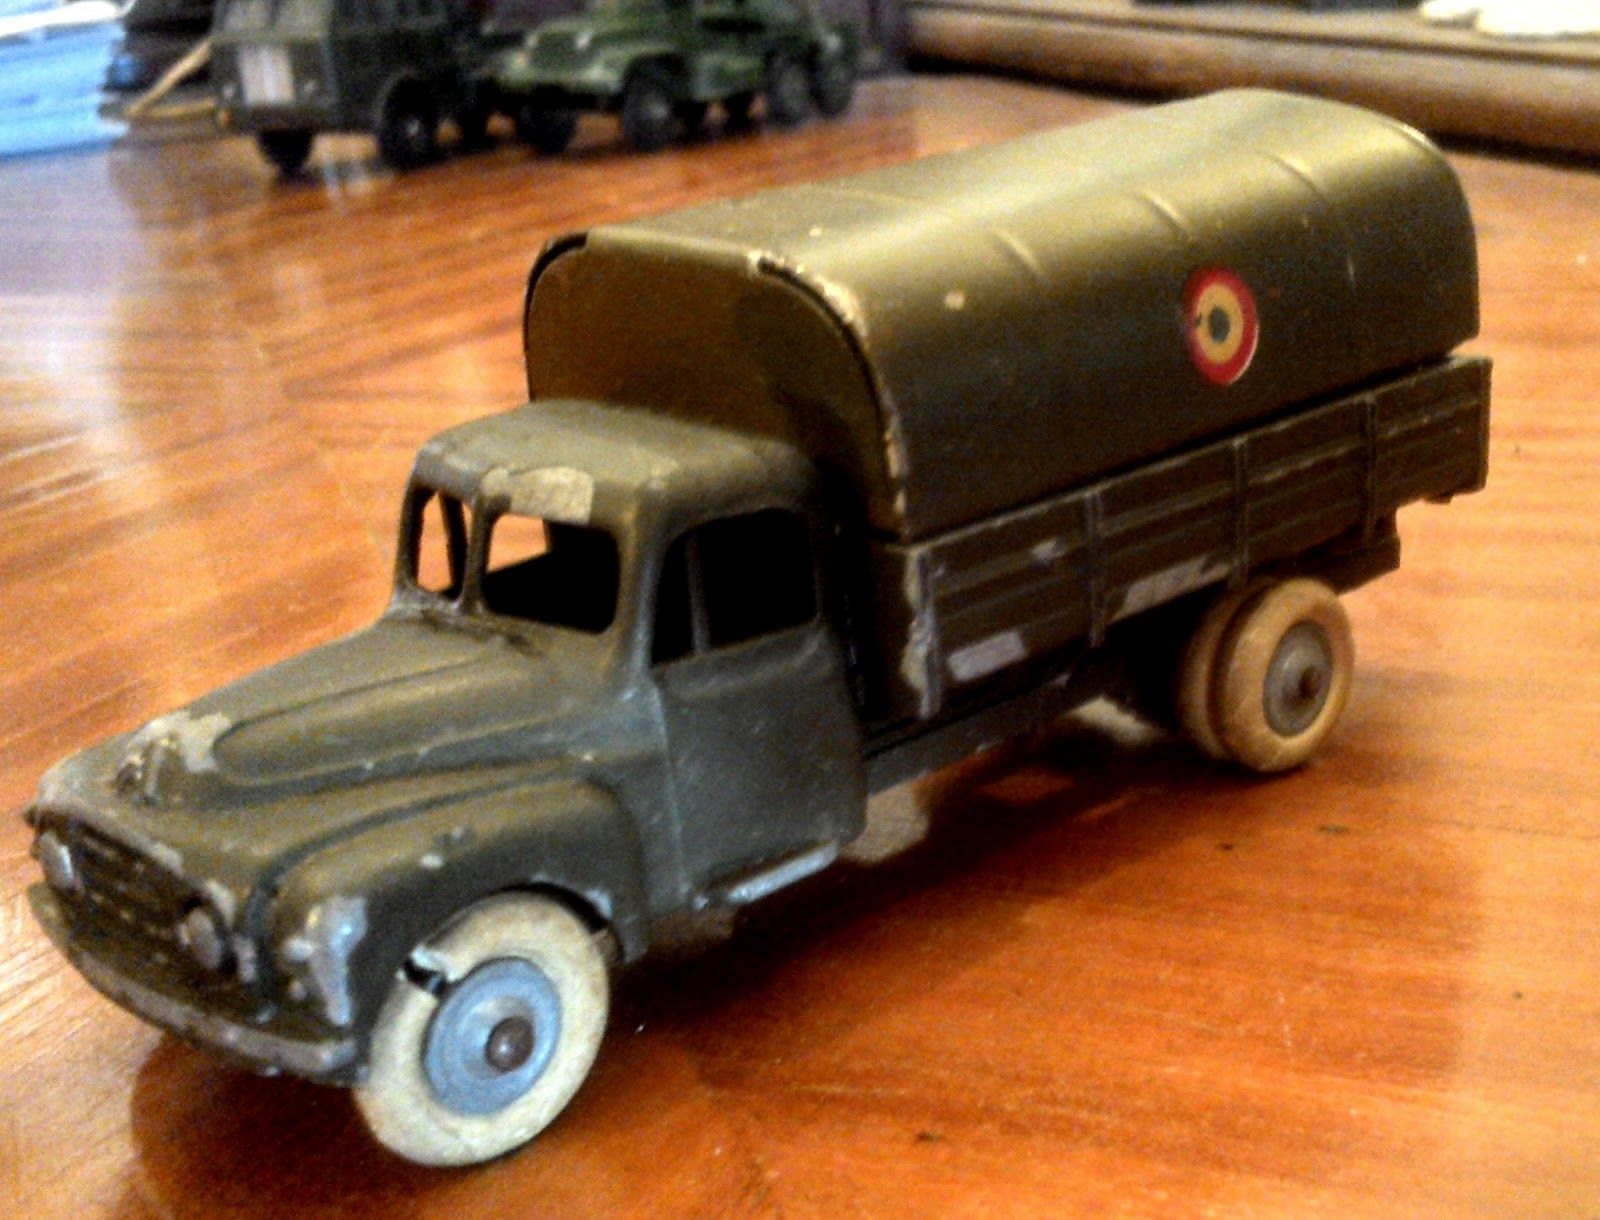 camion jrd france citro n r55 militaire jouet ancien t le j r d no dinky toys i. Black Bedroom Furniture Sets. Home Design Ideas